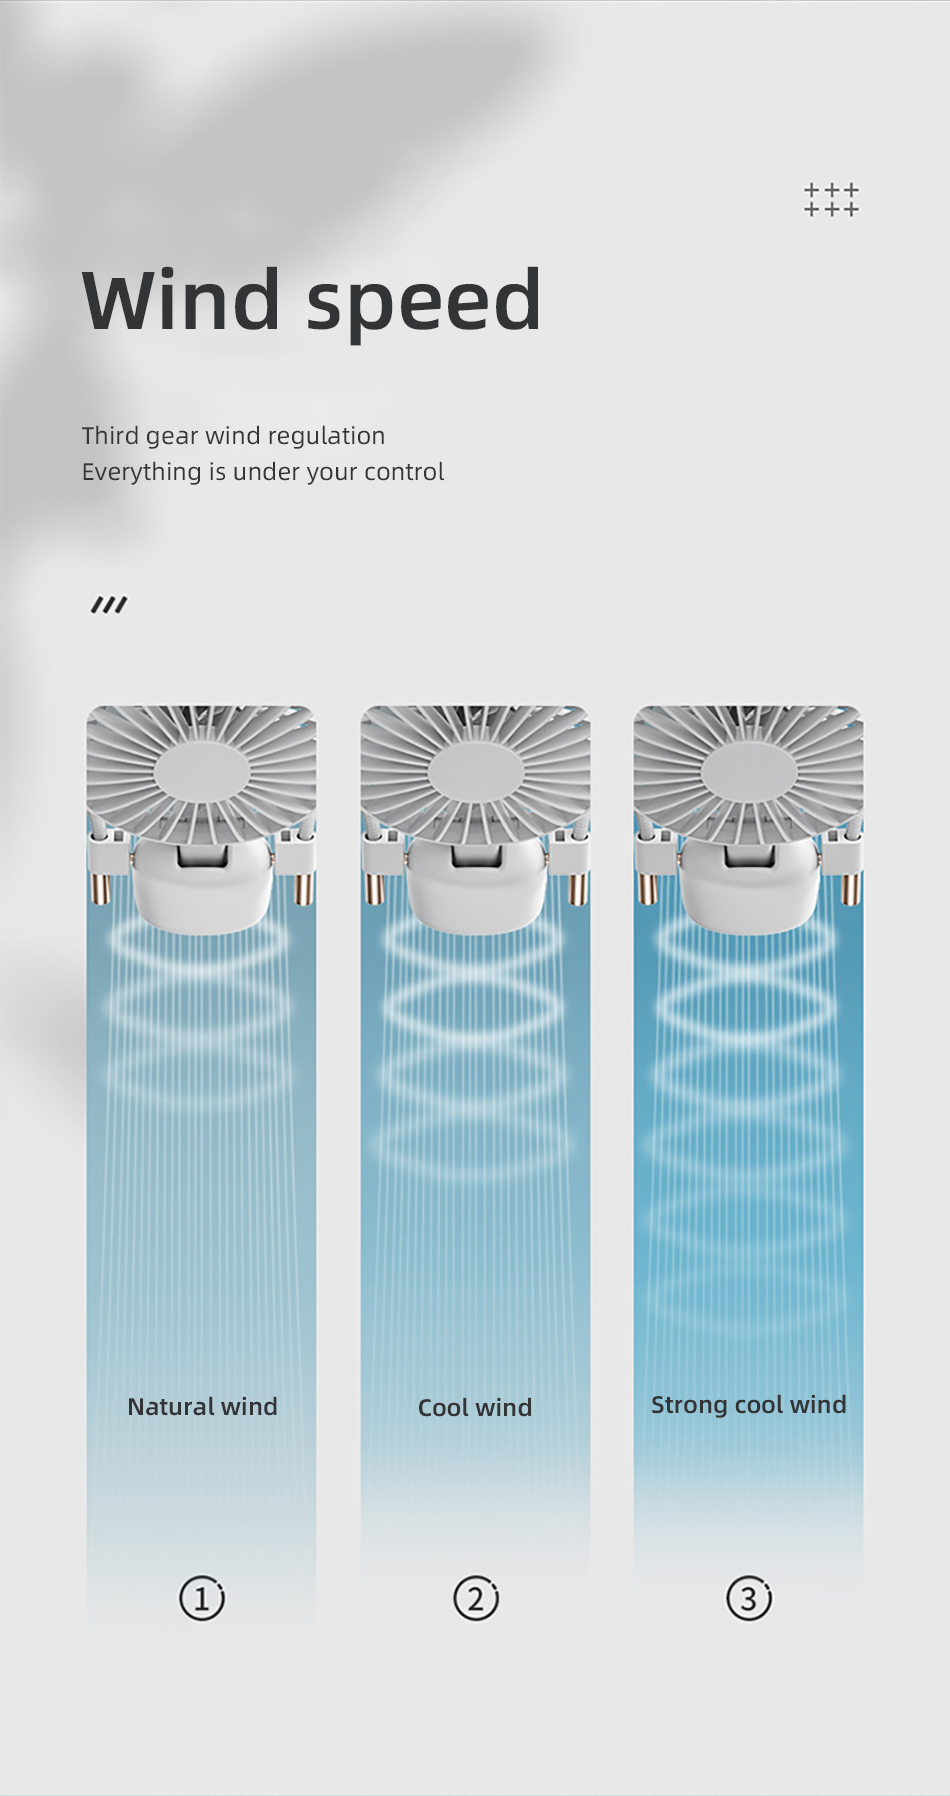 Benks F16 Mini USB Fans Mobile Handheld Fan Hanging Neck Lazy Outdoor Fan Air Cooler Rechargeable Foldable Desktop Office Fans (14)